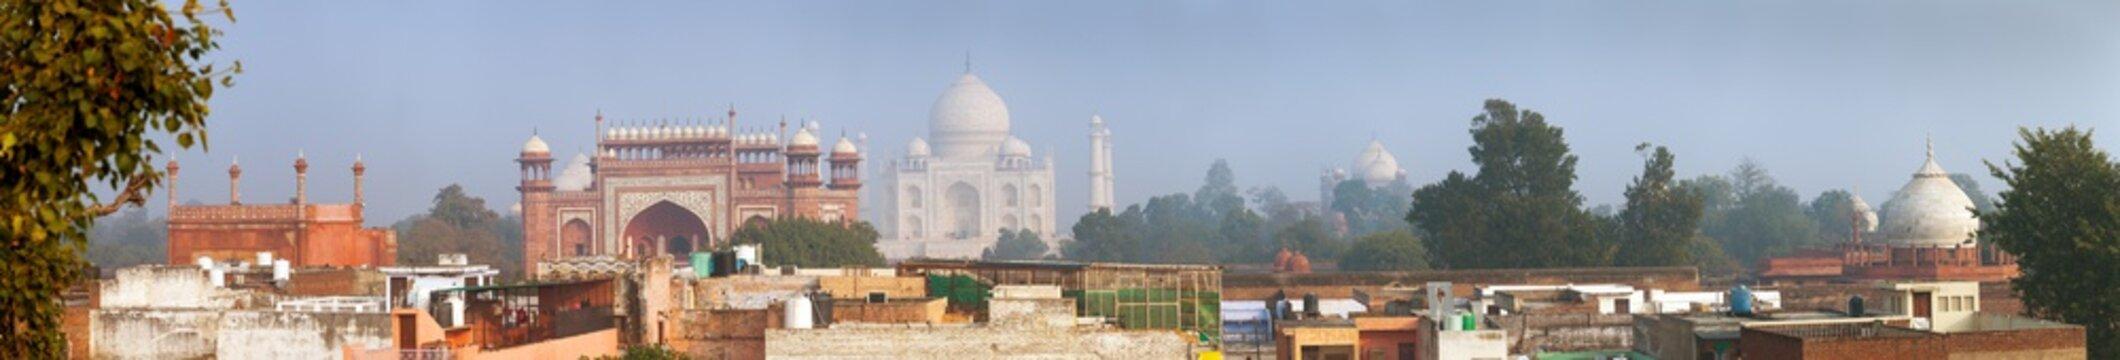 Taj Mahal over the city, panoramic view, Agra India